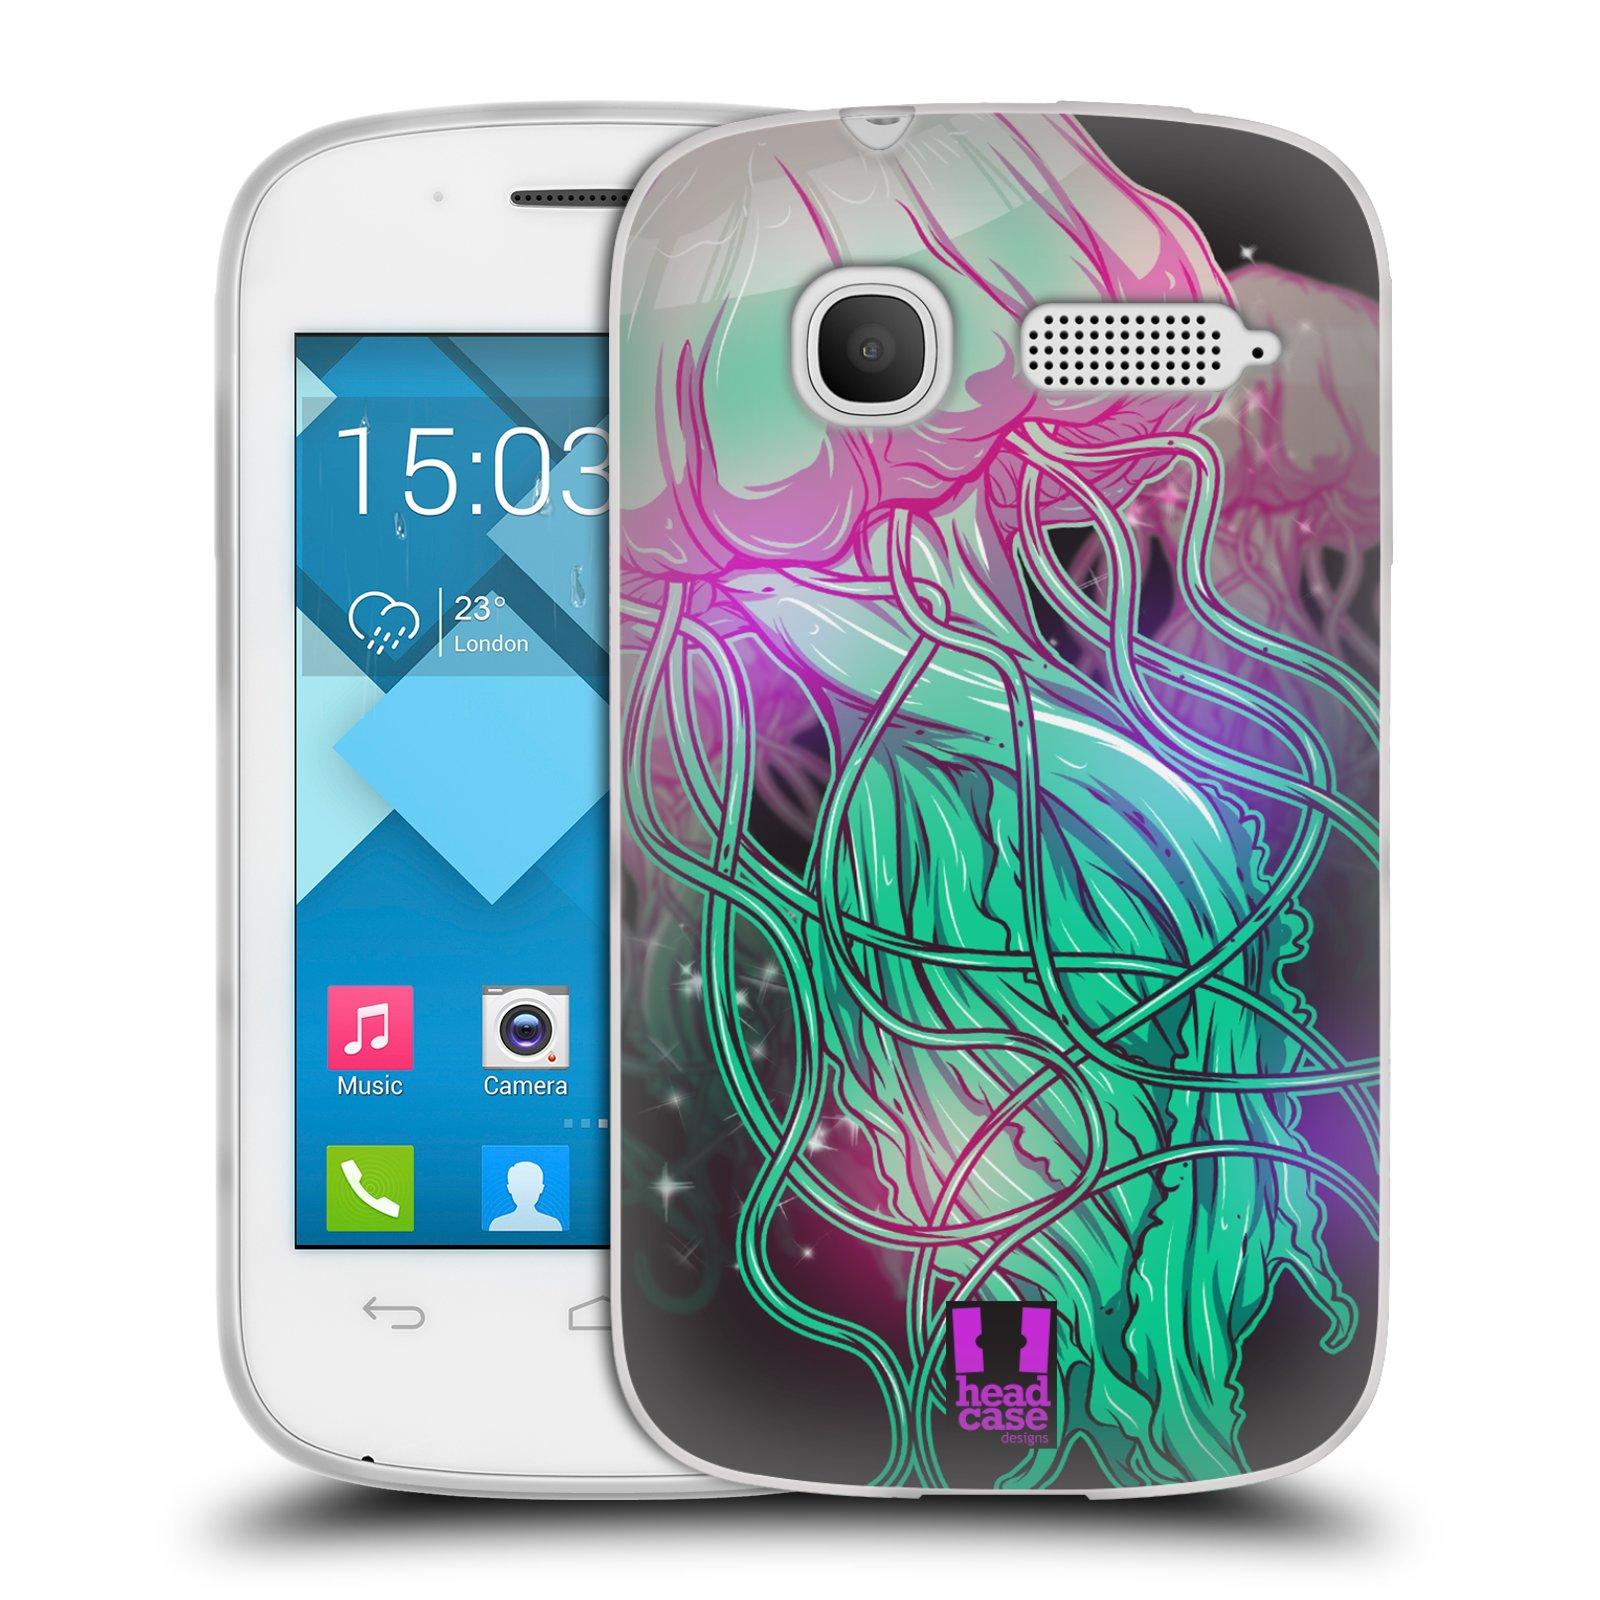 HEAD CASE silikonový obal na mobil Alcatel POP C1 OT-4015D vzor mořská monstra medůza